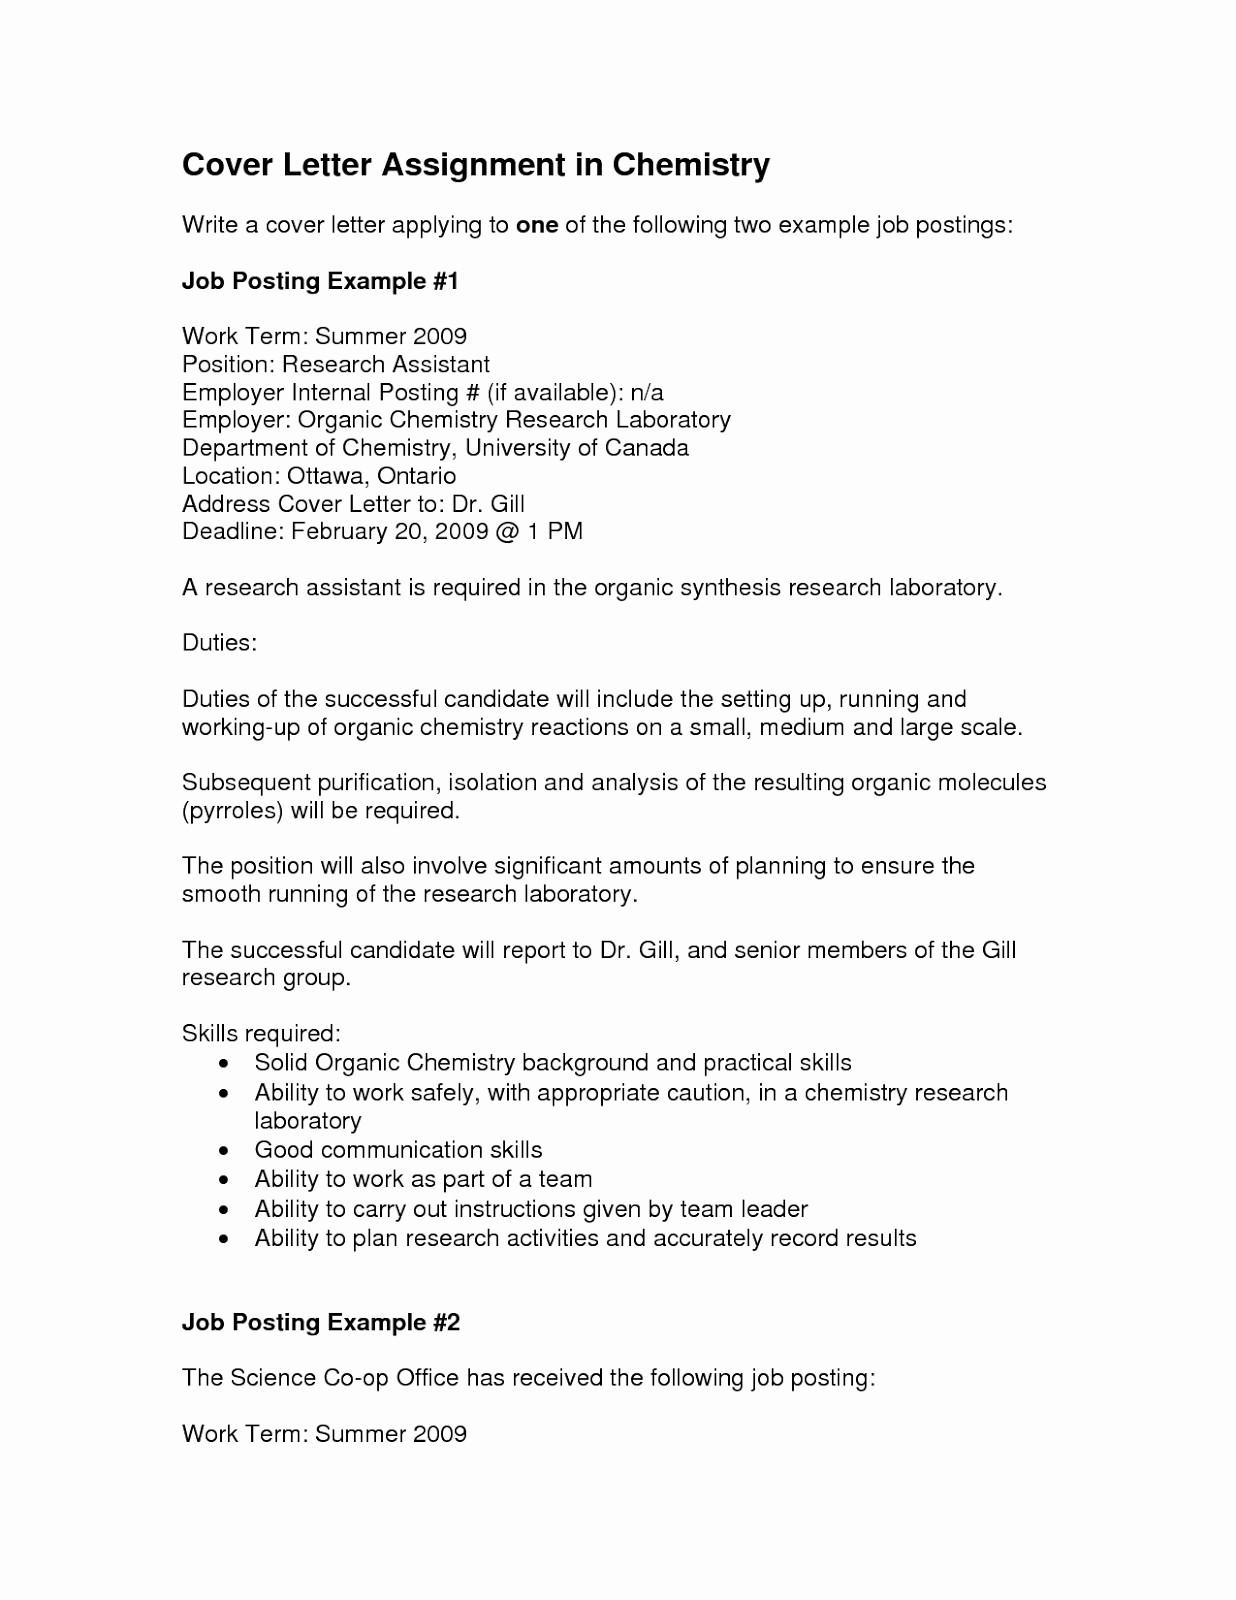 Resume for Internal Promotion Template Fresh Sample Cover Letter for Internal Position Template